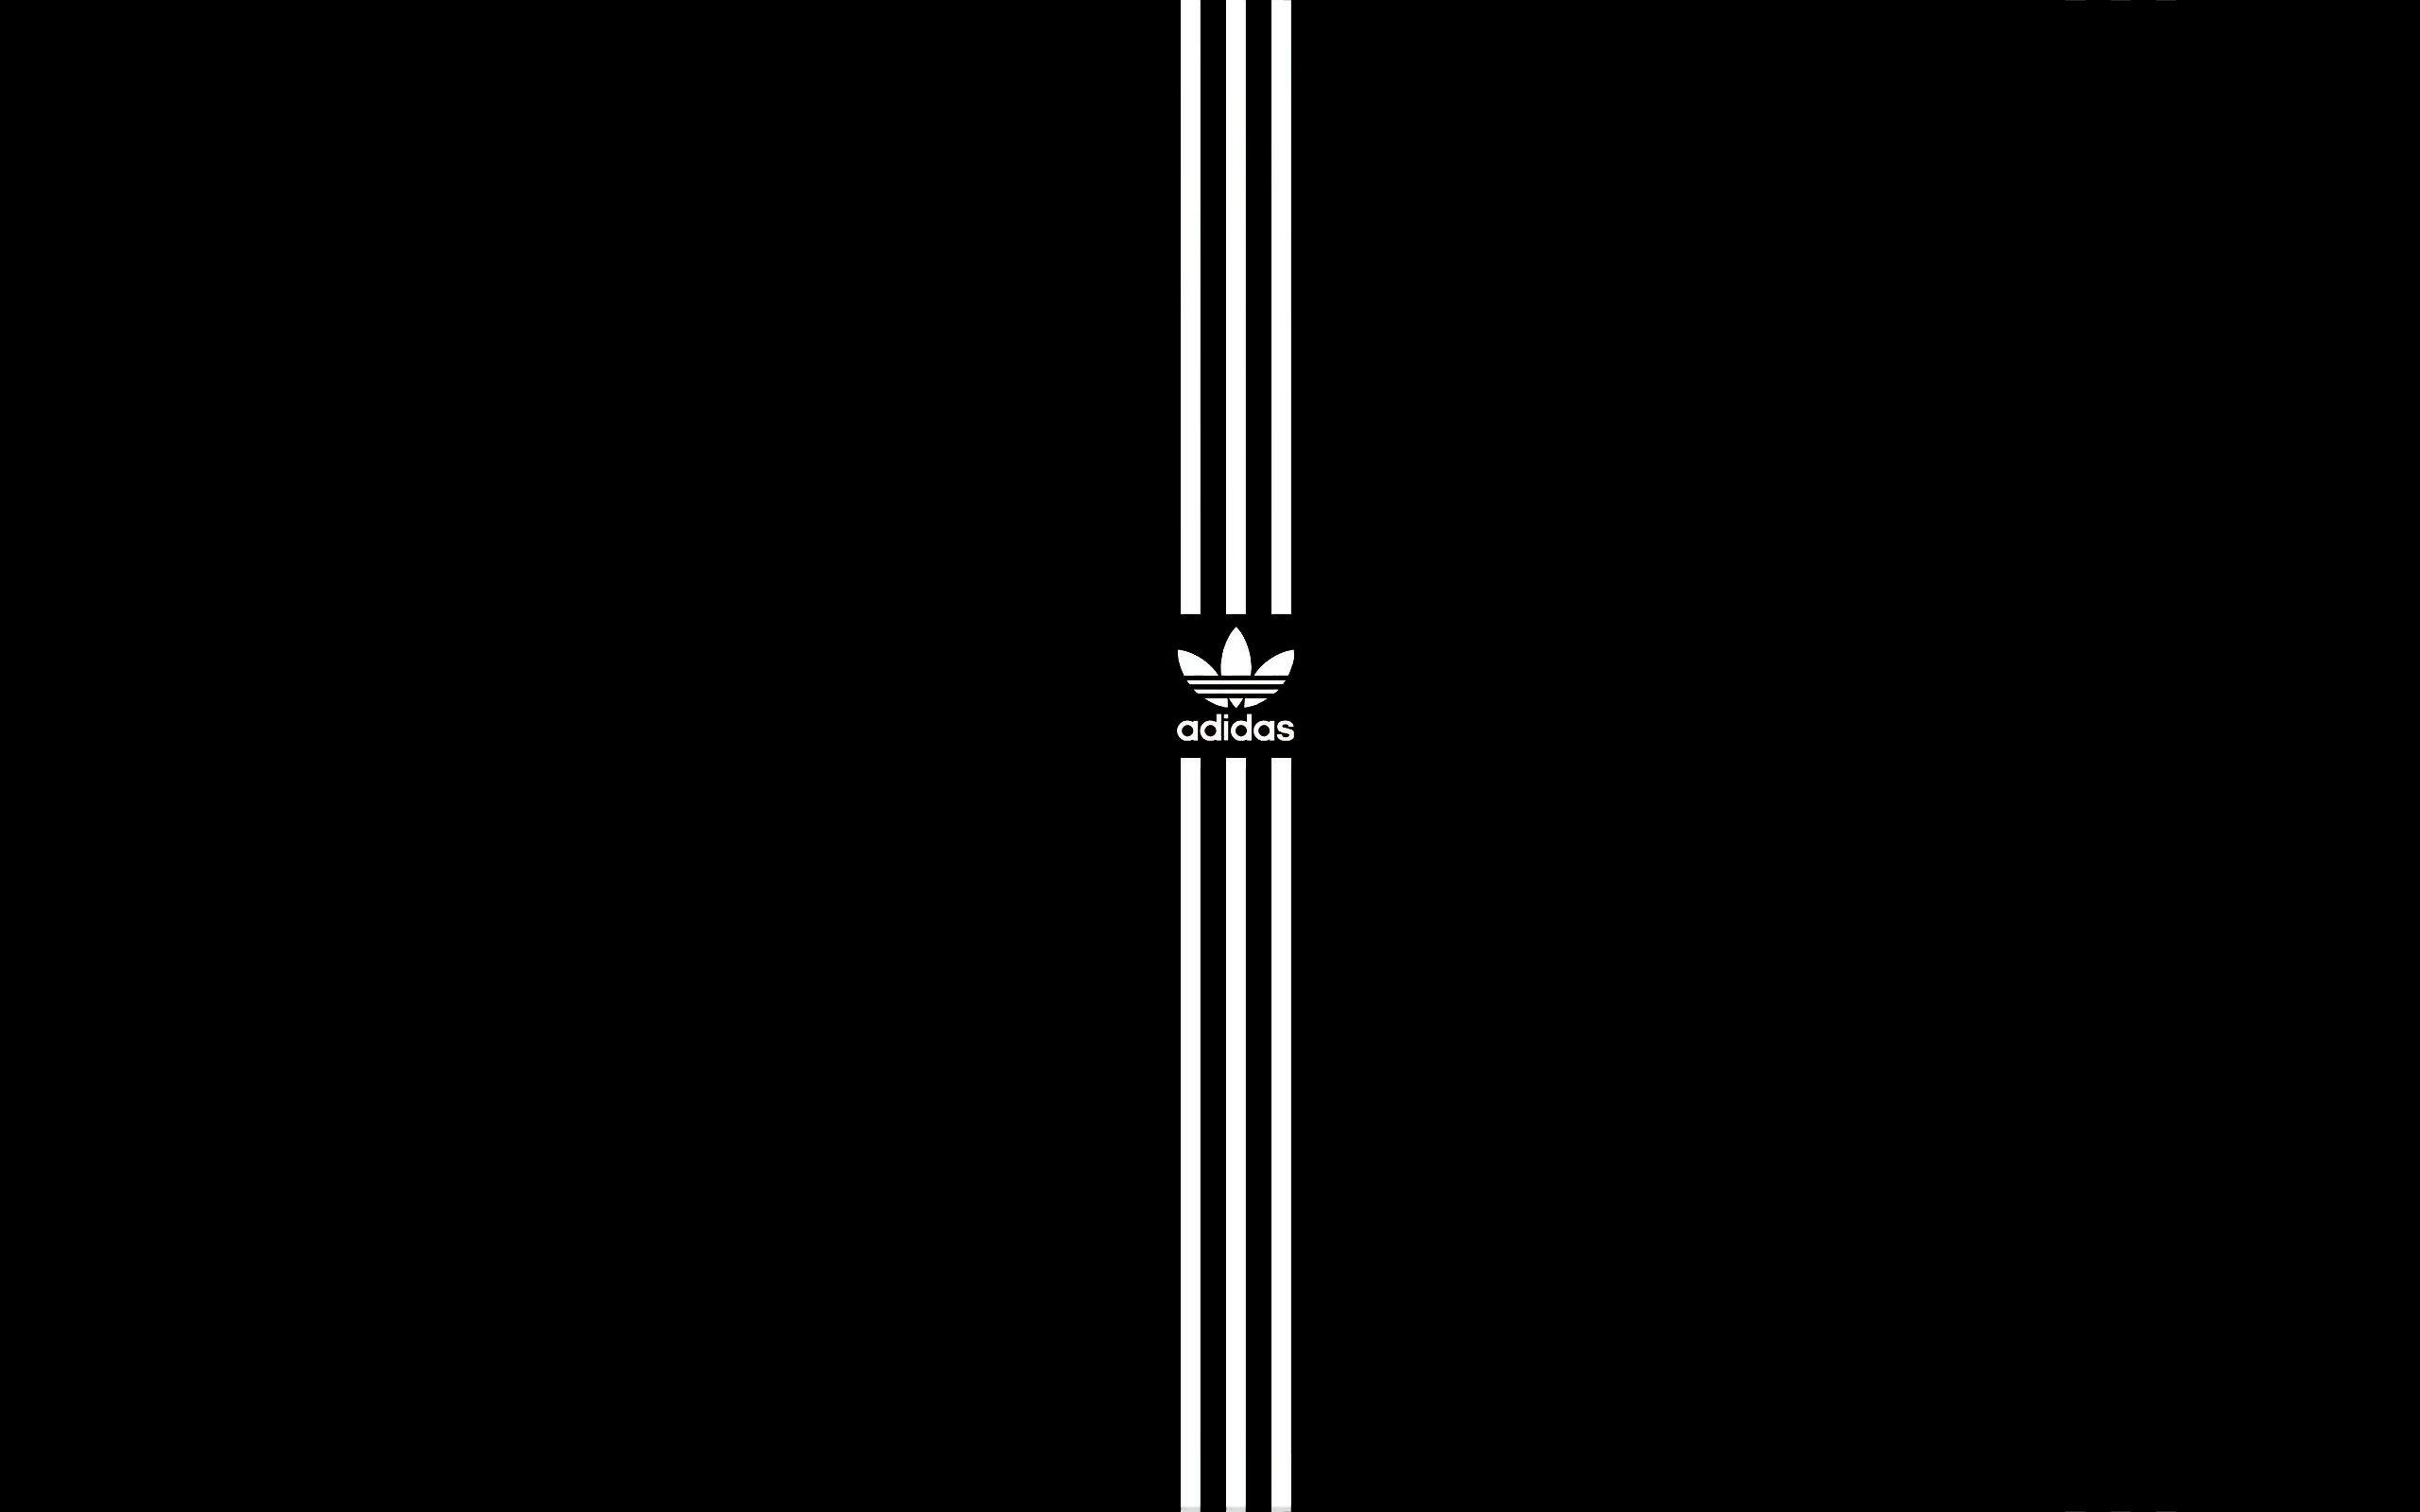 … adidas iphone wallpaper wallpapersafari; adidas wallpapers  wallpapersafari; adidas wallpapers wallpaper cave …